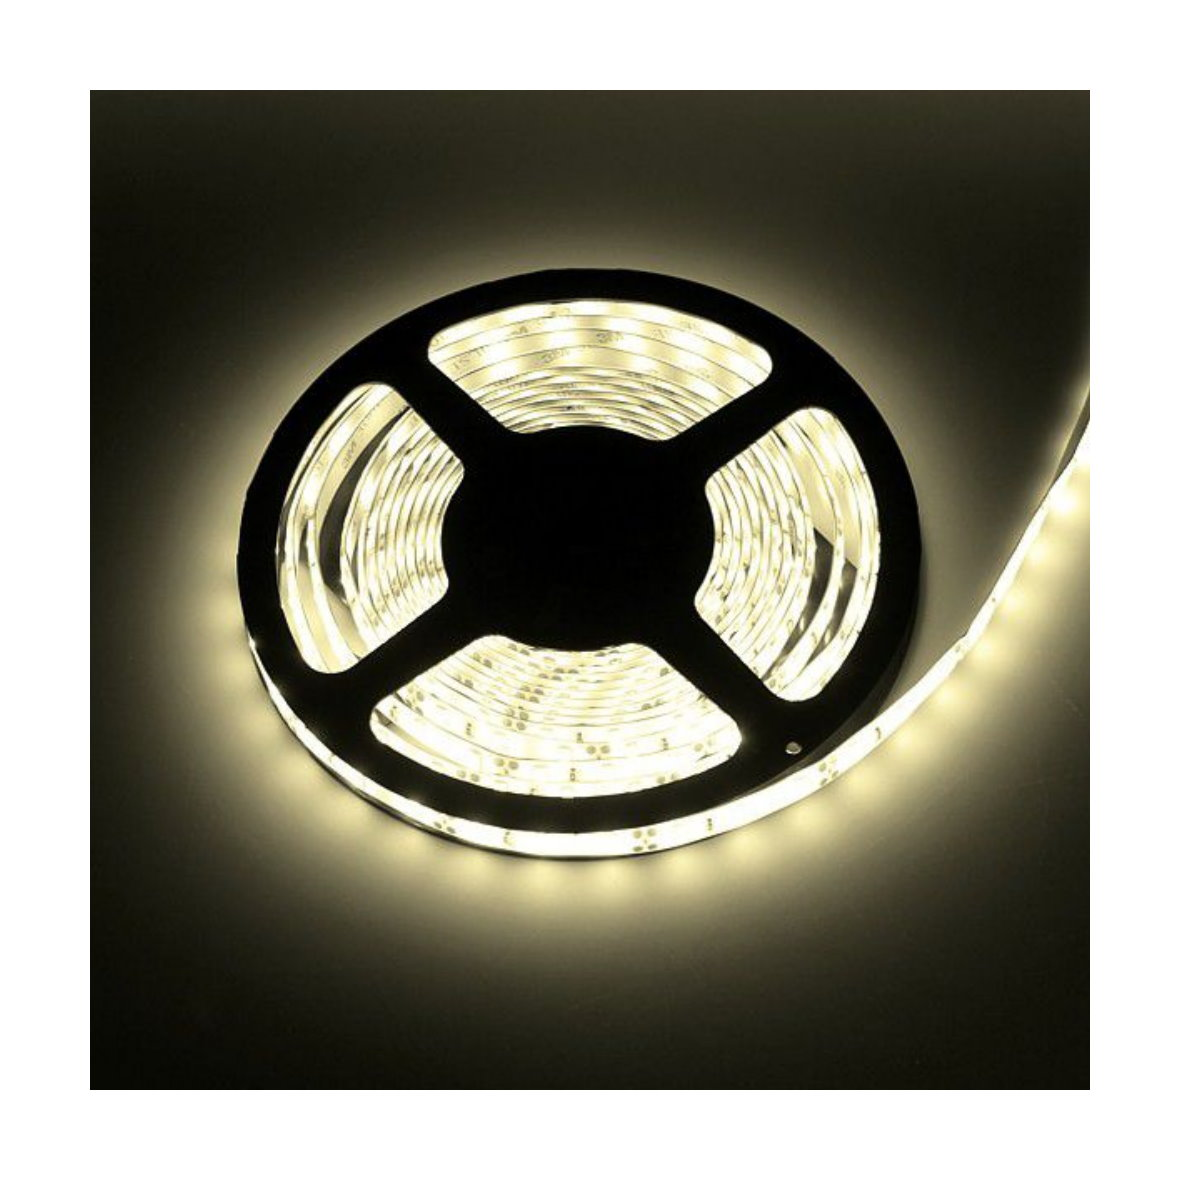 5m 300 smd lichtband licht strip leiste band streifen 3528 5630 led rgb dimmbar ebay. Black Bedroom Furniture Sets. Home Design Ideas